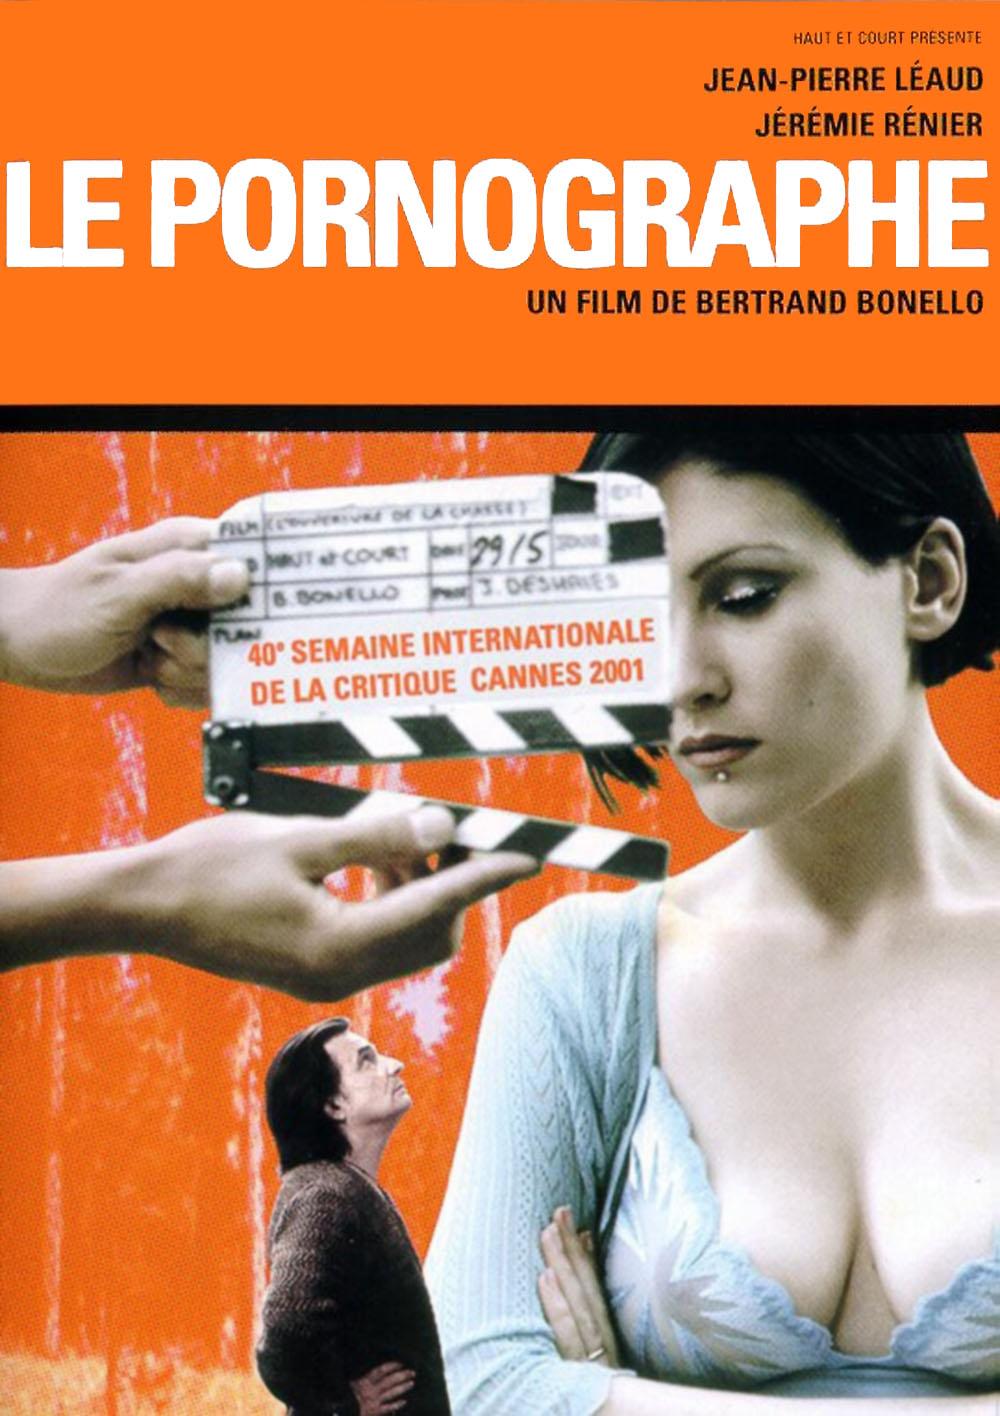 http://4.bp.blogspot.com/-OucufsY8LPk/TpQqjimv7lI/AAAAAAAAERs/C1Izp67IeJE/s1600/Le+Pornographe+%282001%29.jpg